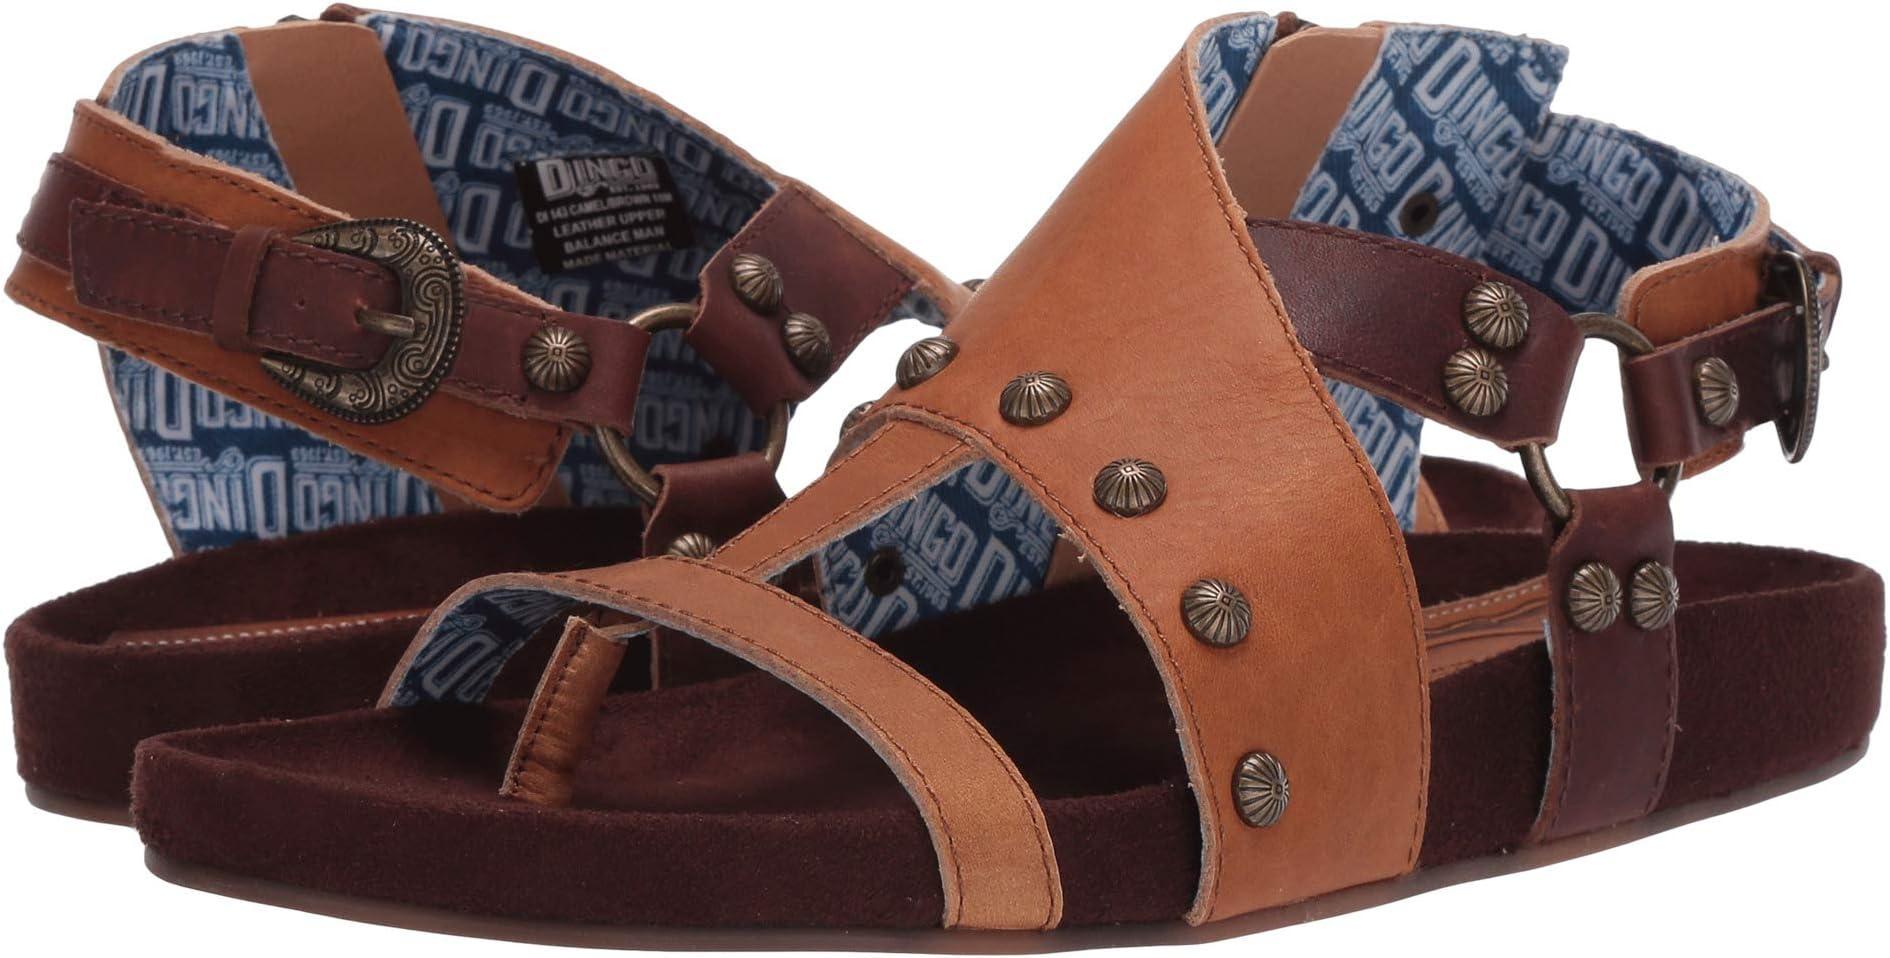 TC-1-Sandals-2020-04-28